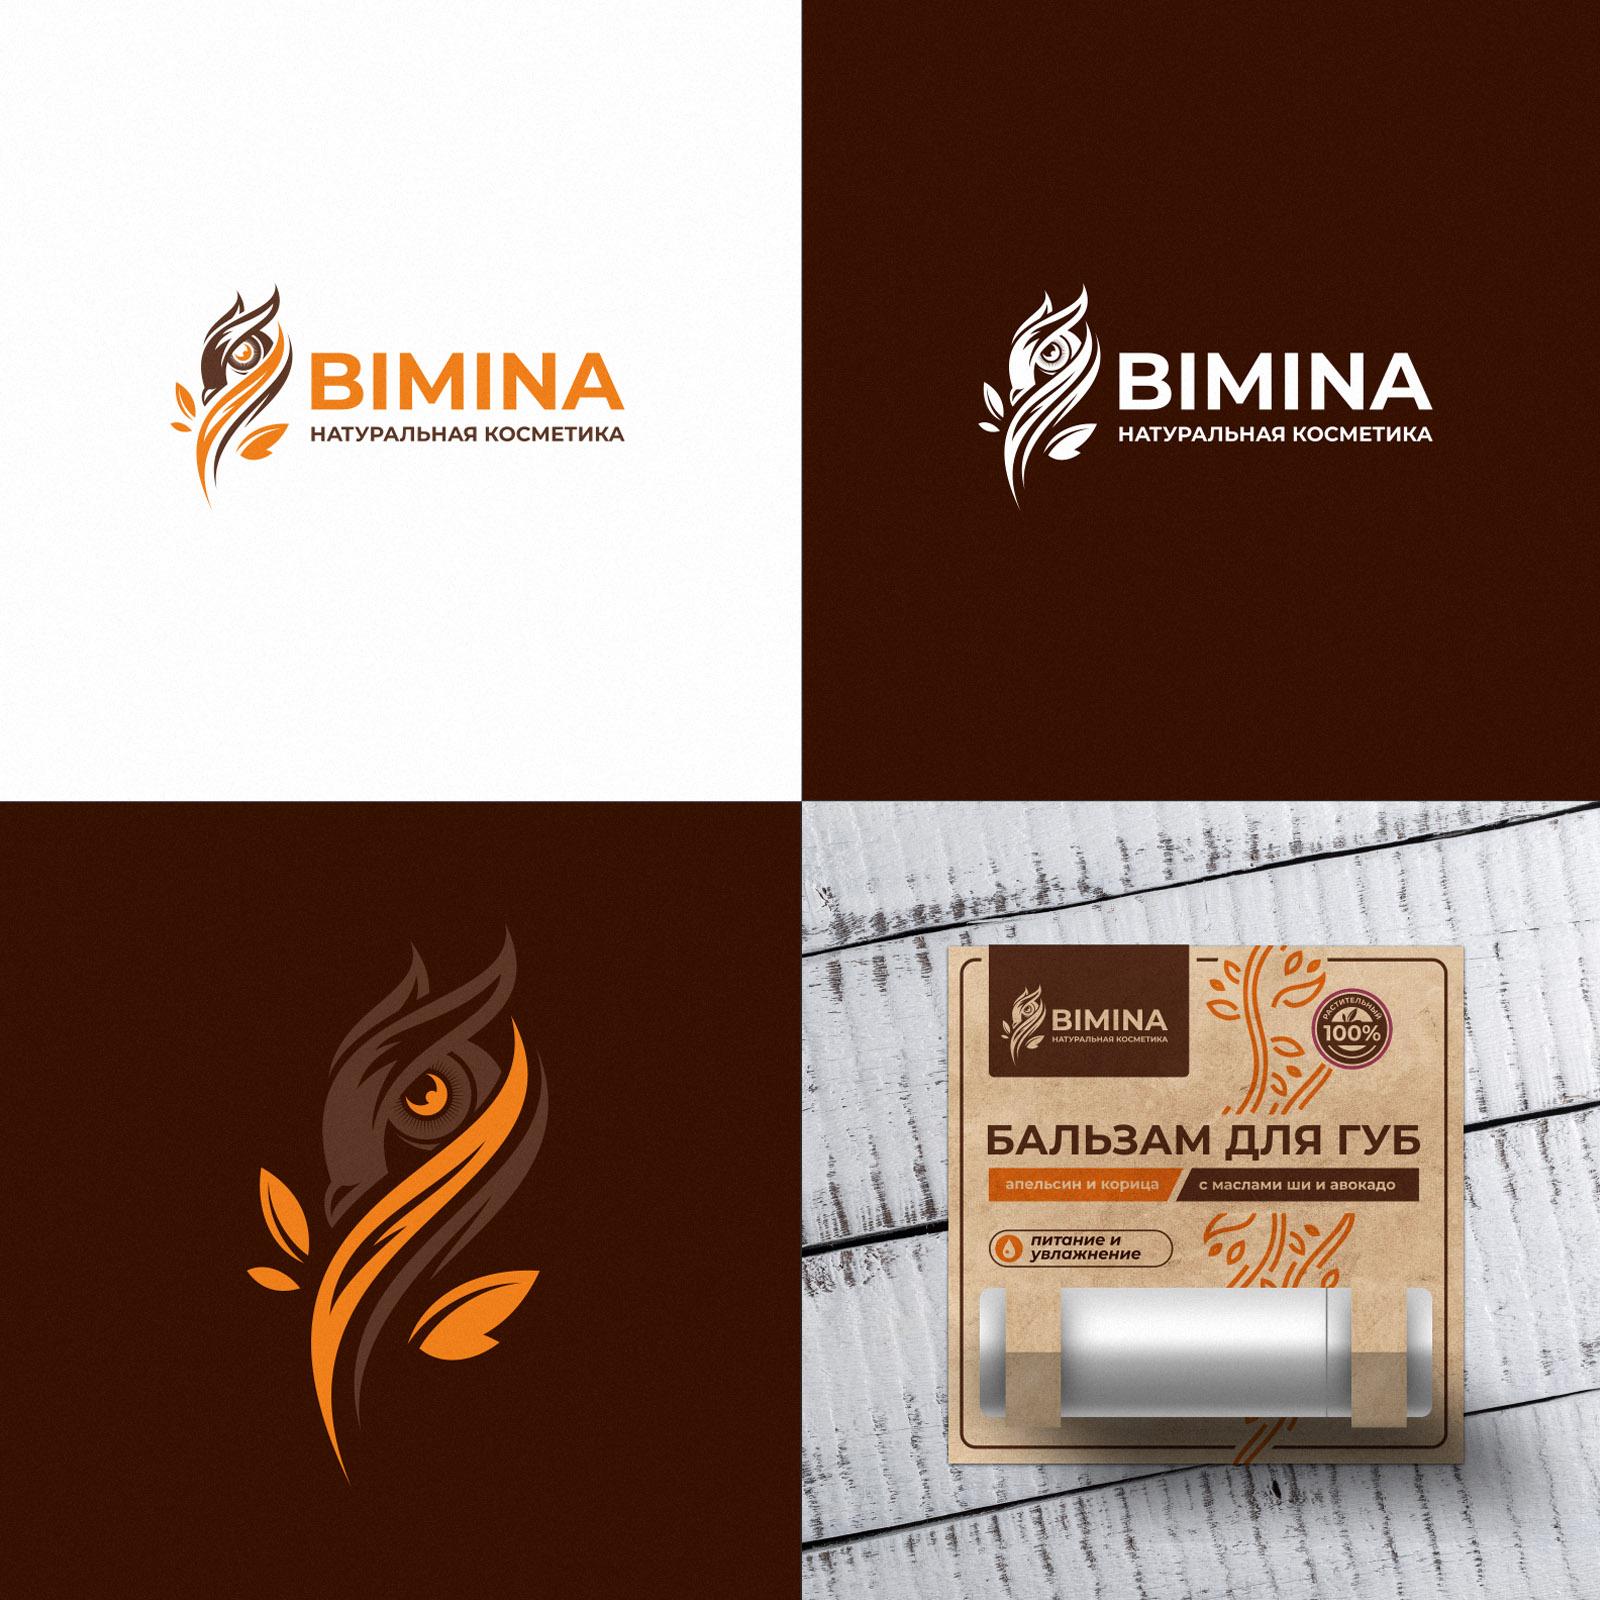 Bimina Organics